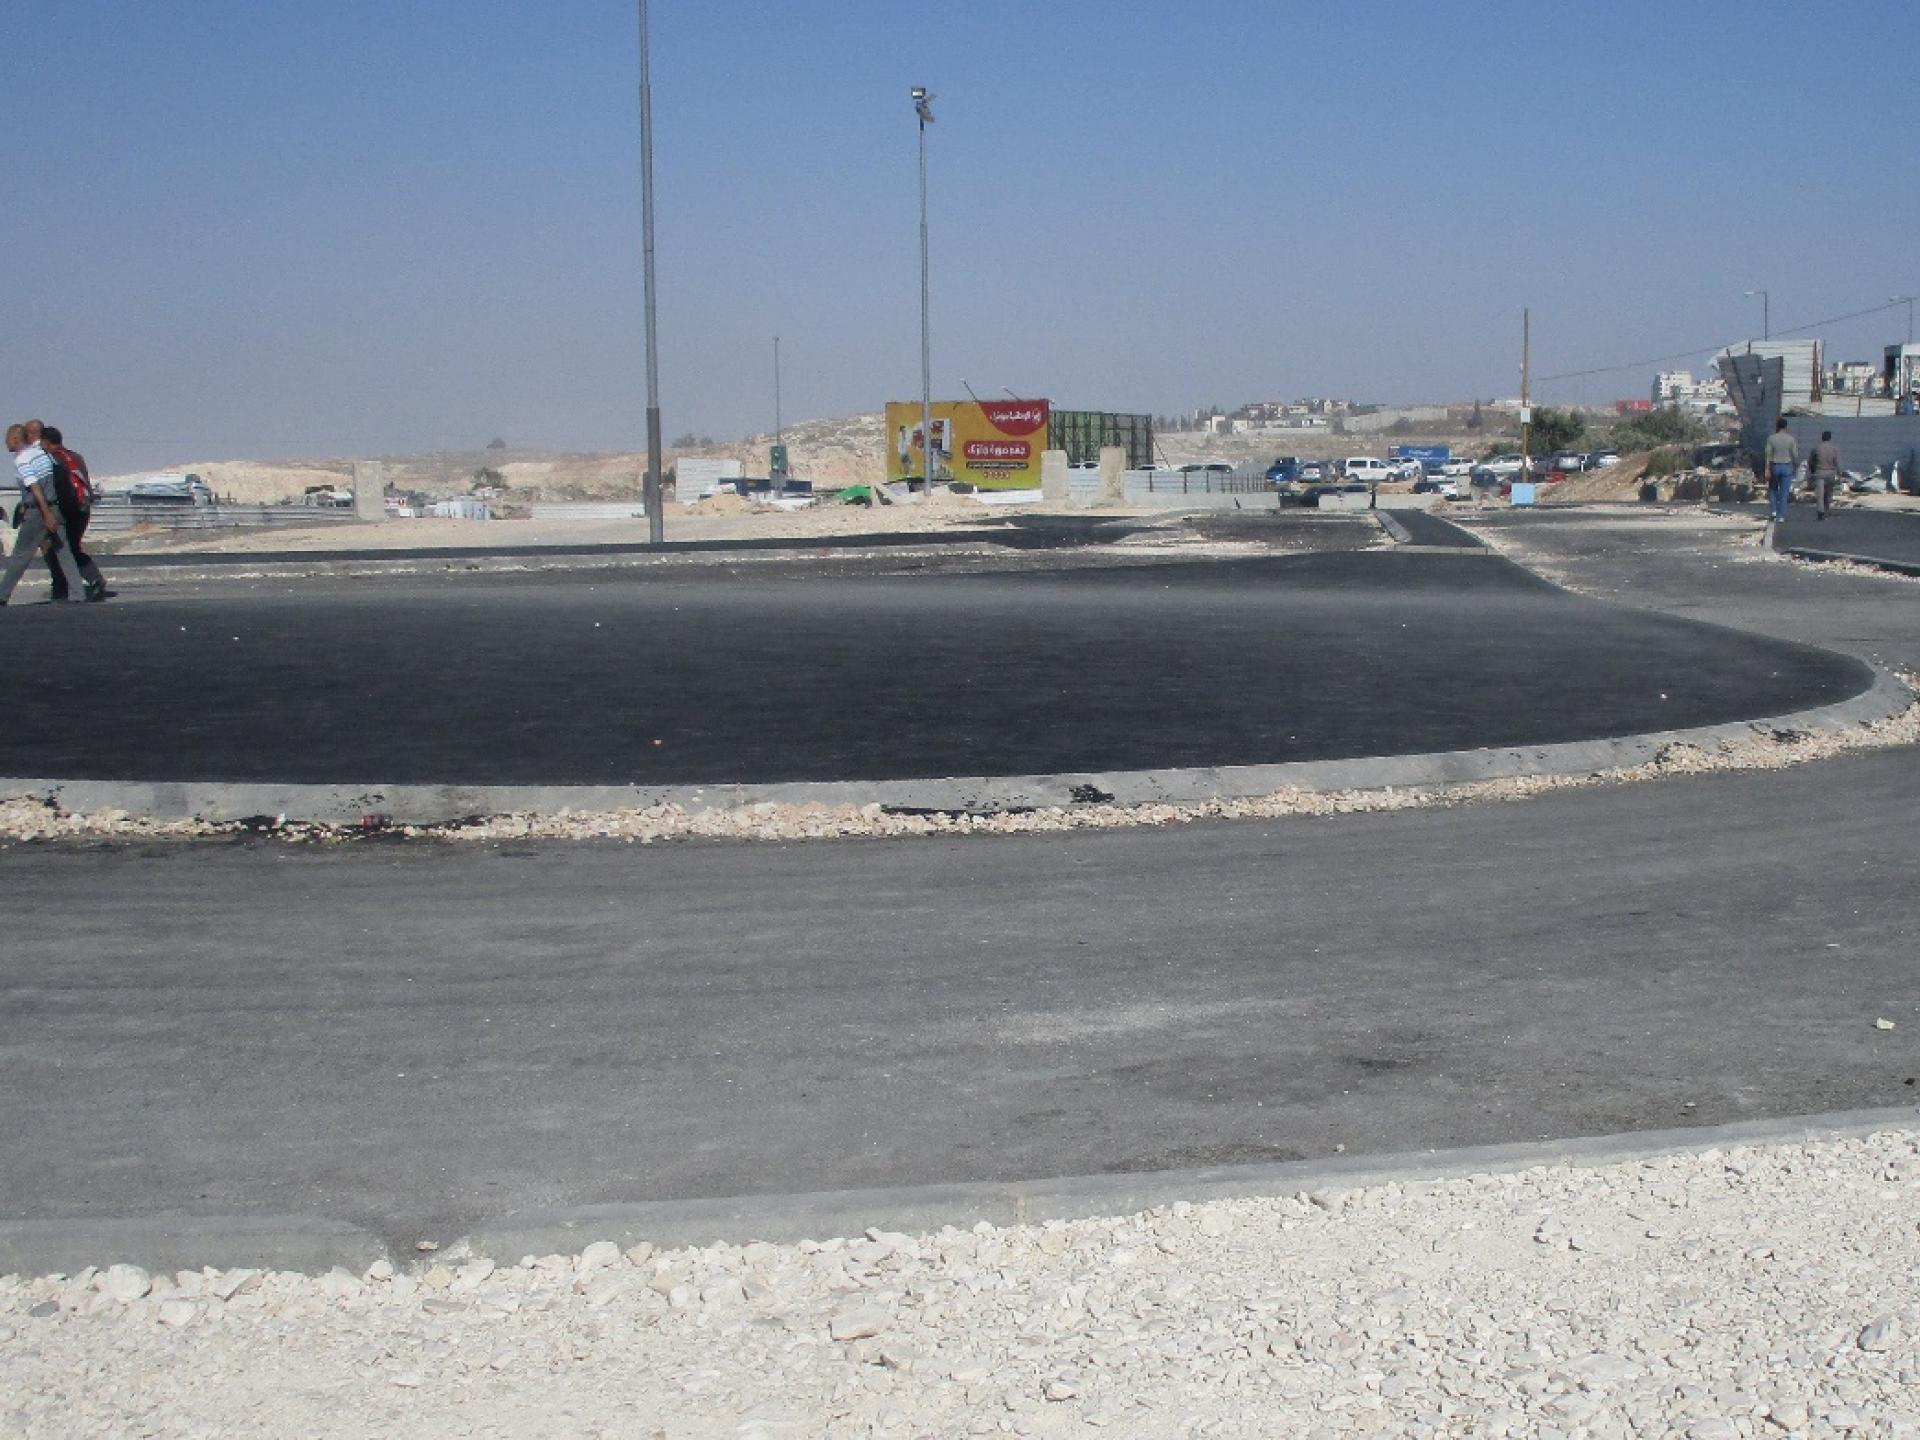 Circular lanes were paved at varying heights